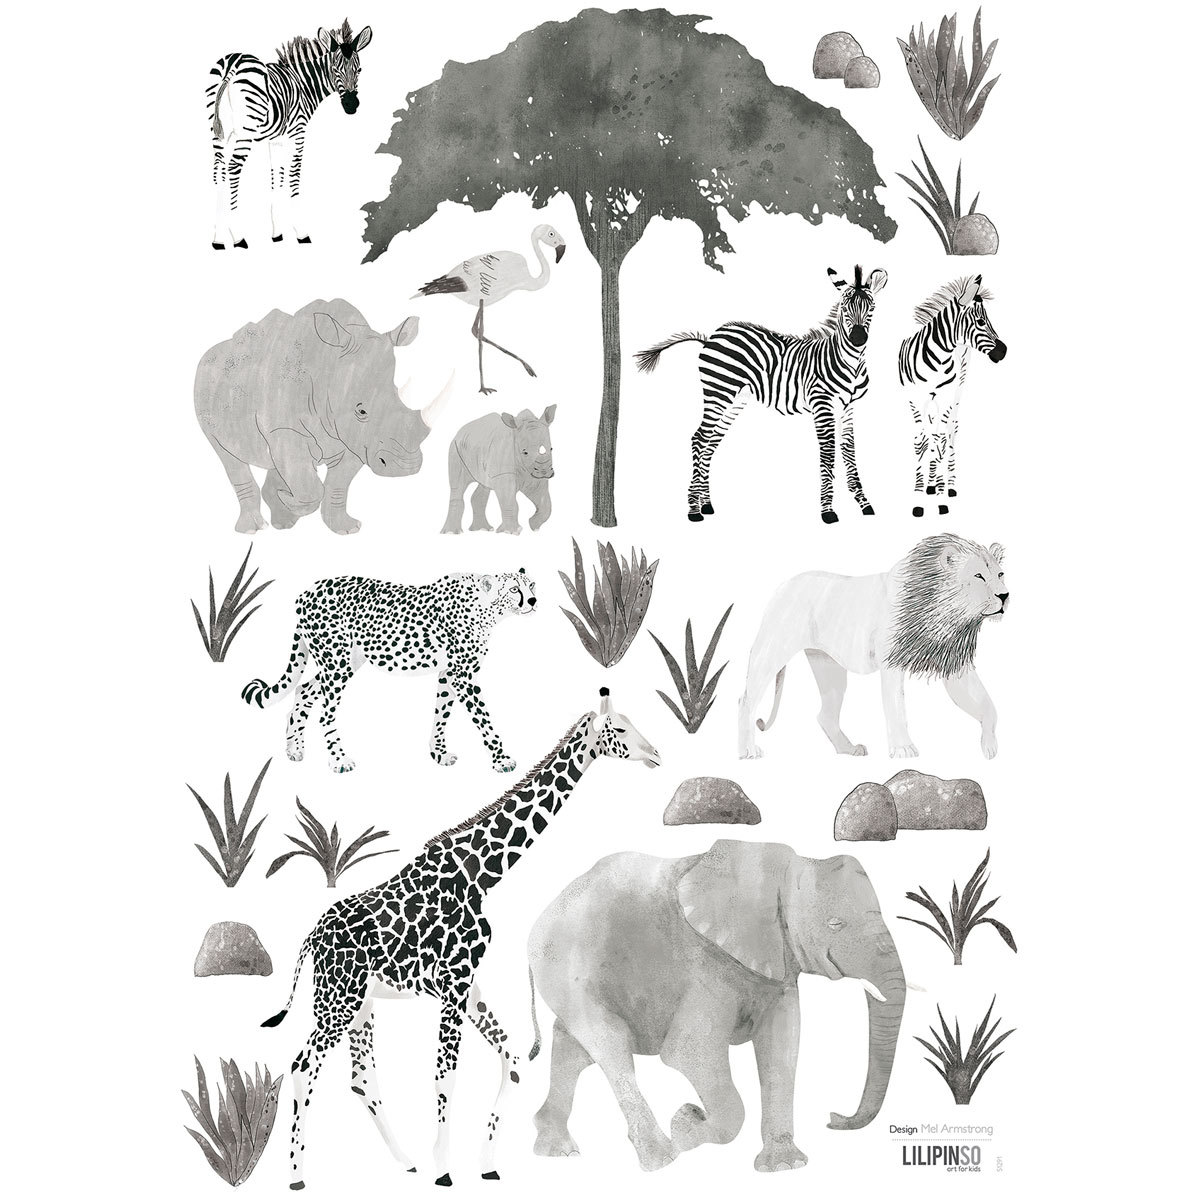 Sticker Serengeti - Stickers A3 - Planche Composée d'Animaux